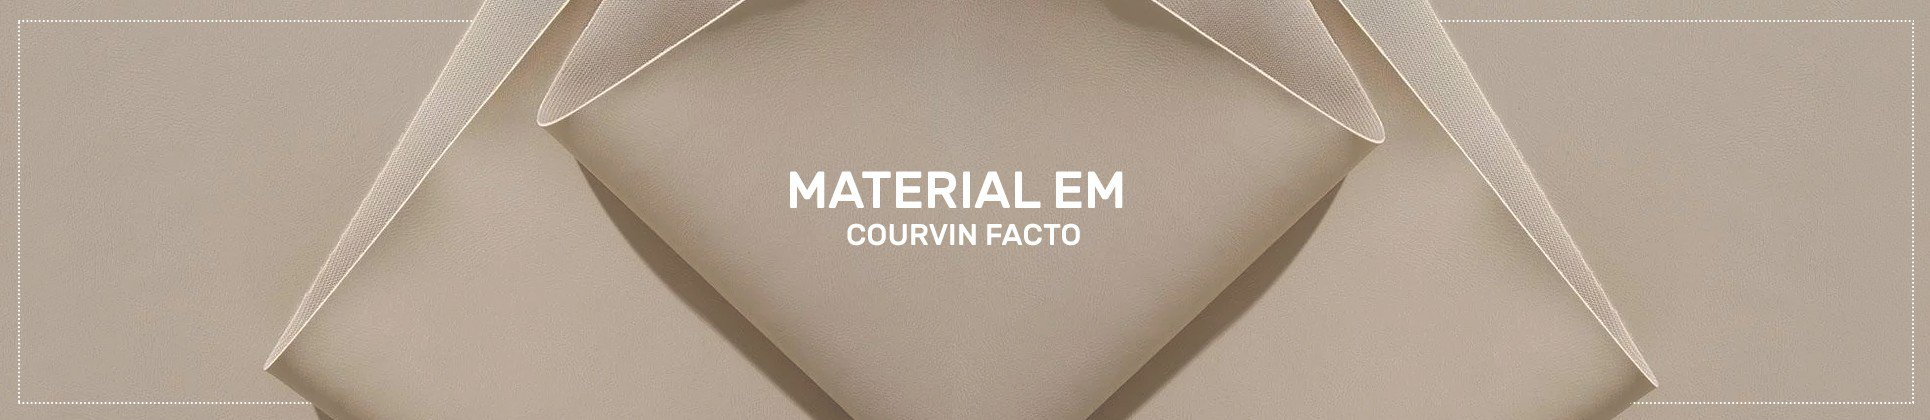 Material em Courvin